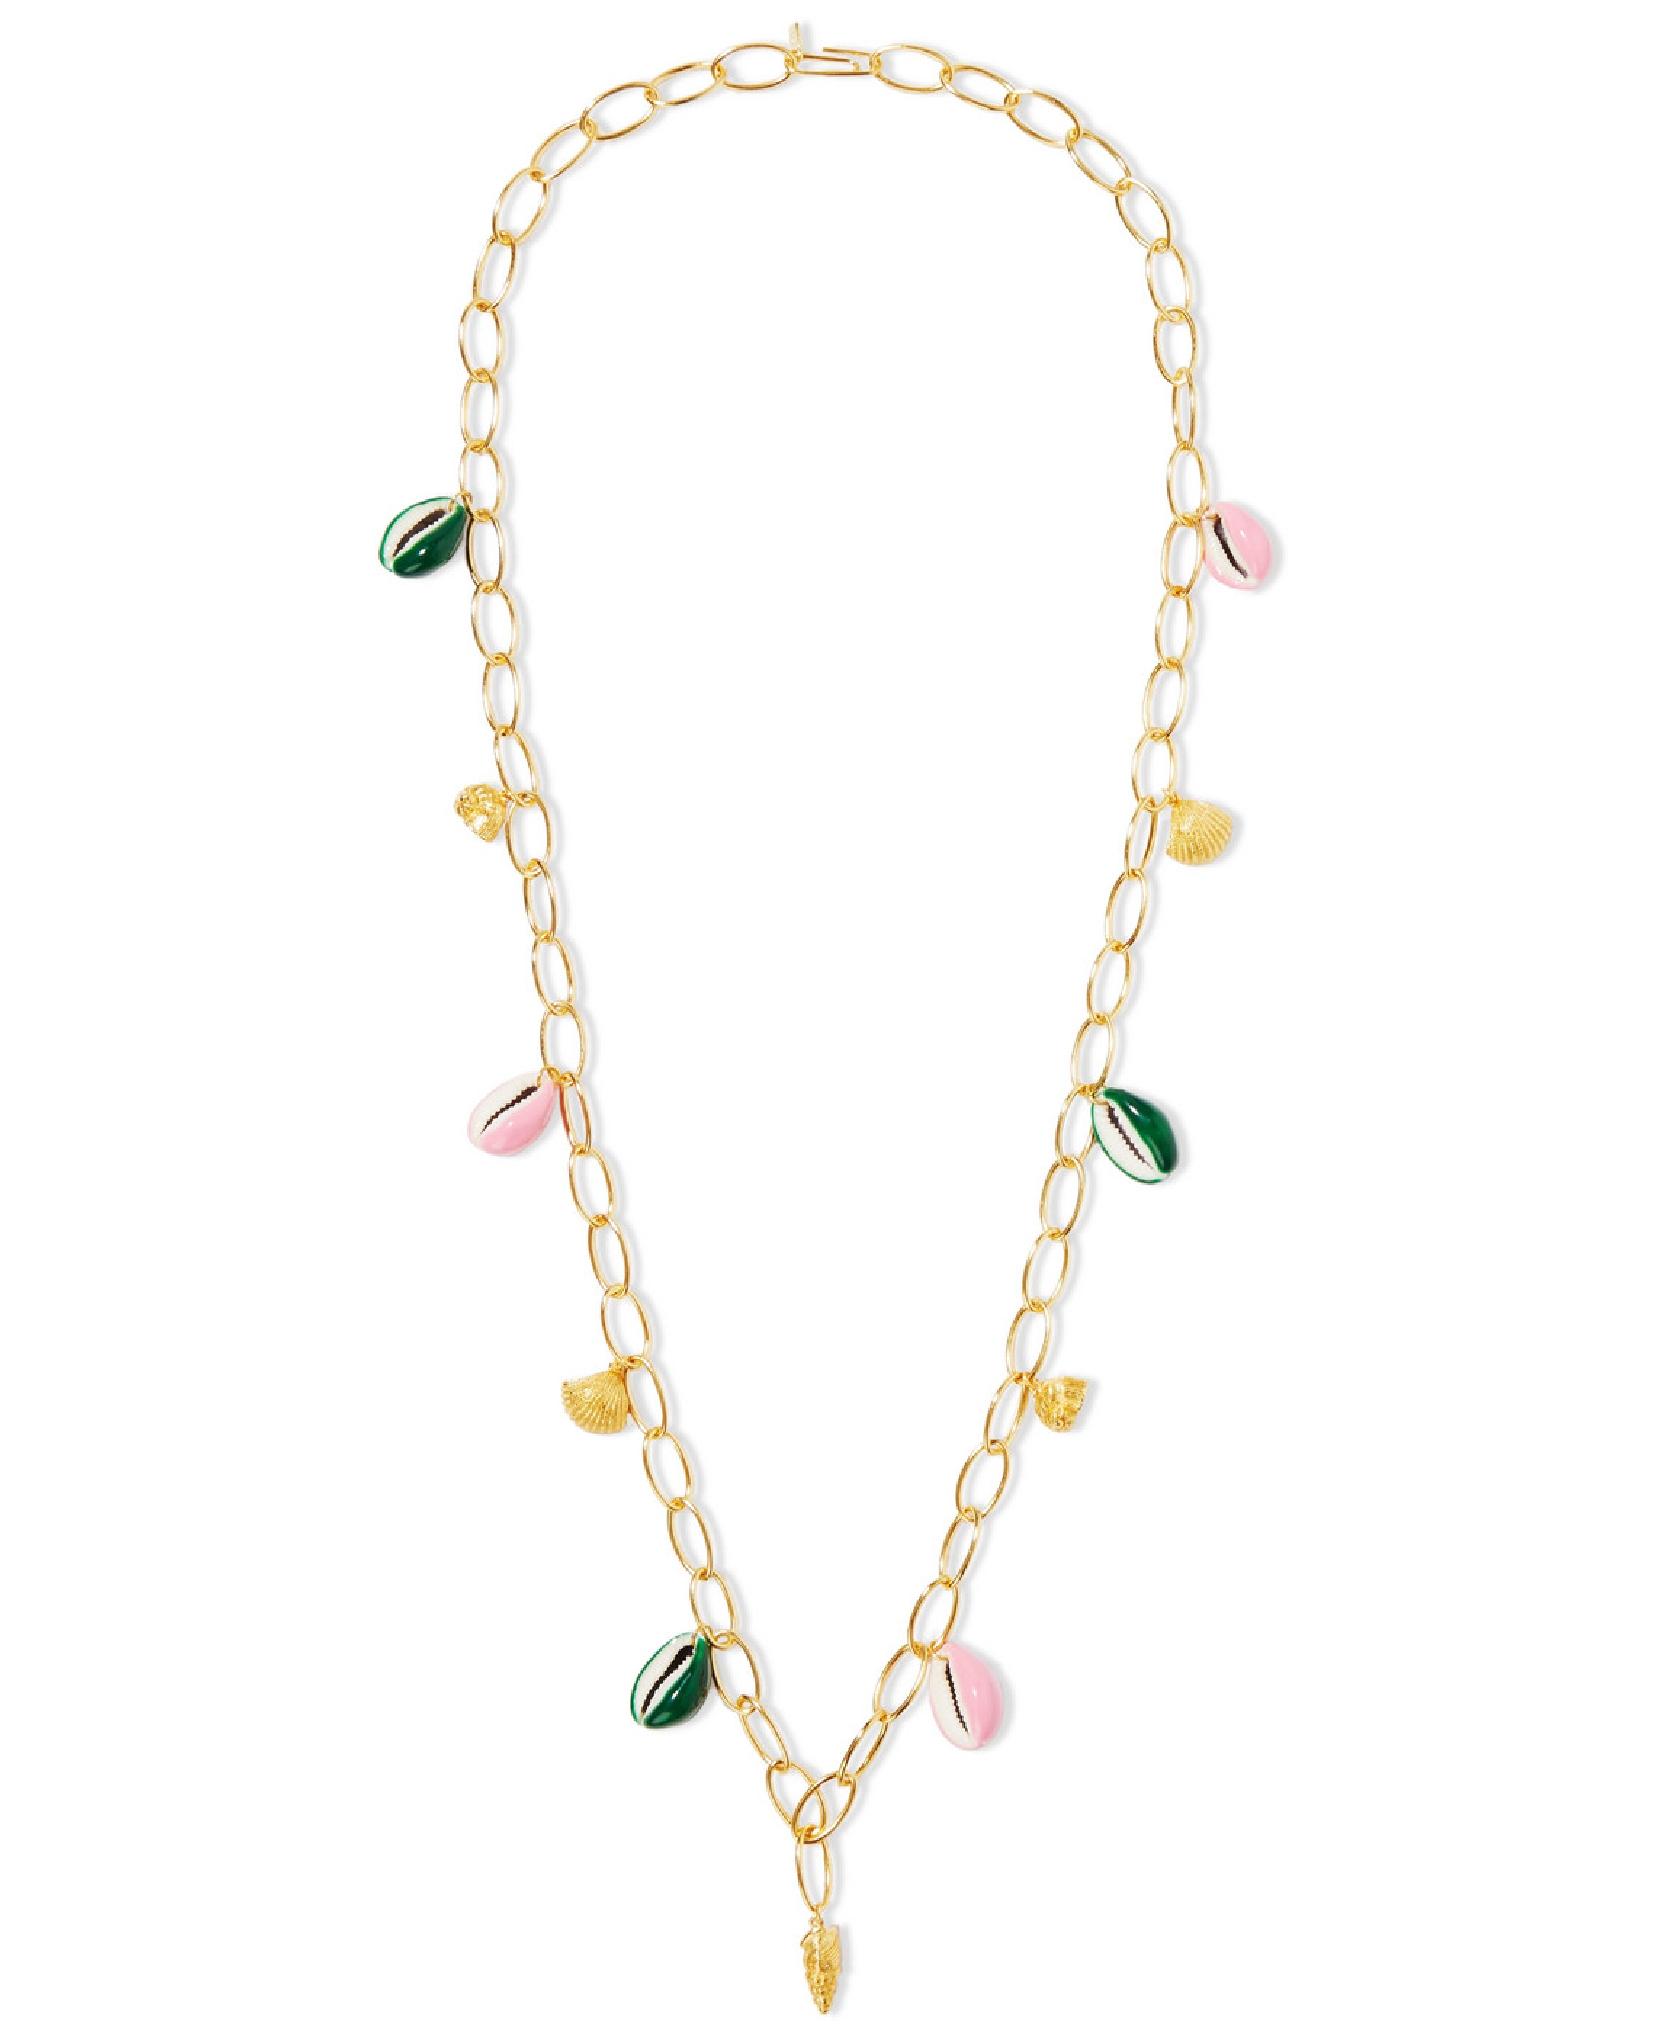 Aurelie Bidermann - Panama Gold-Plated, Shell And Enamel Necklace